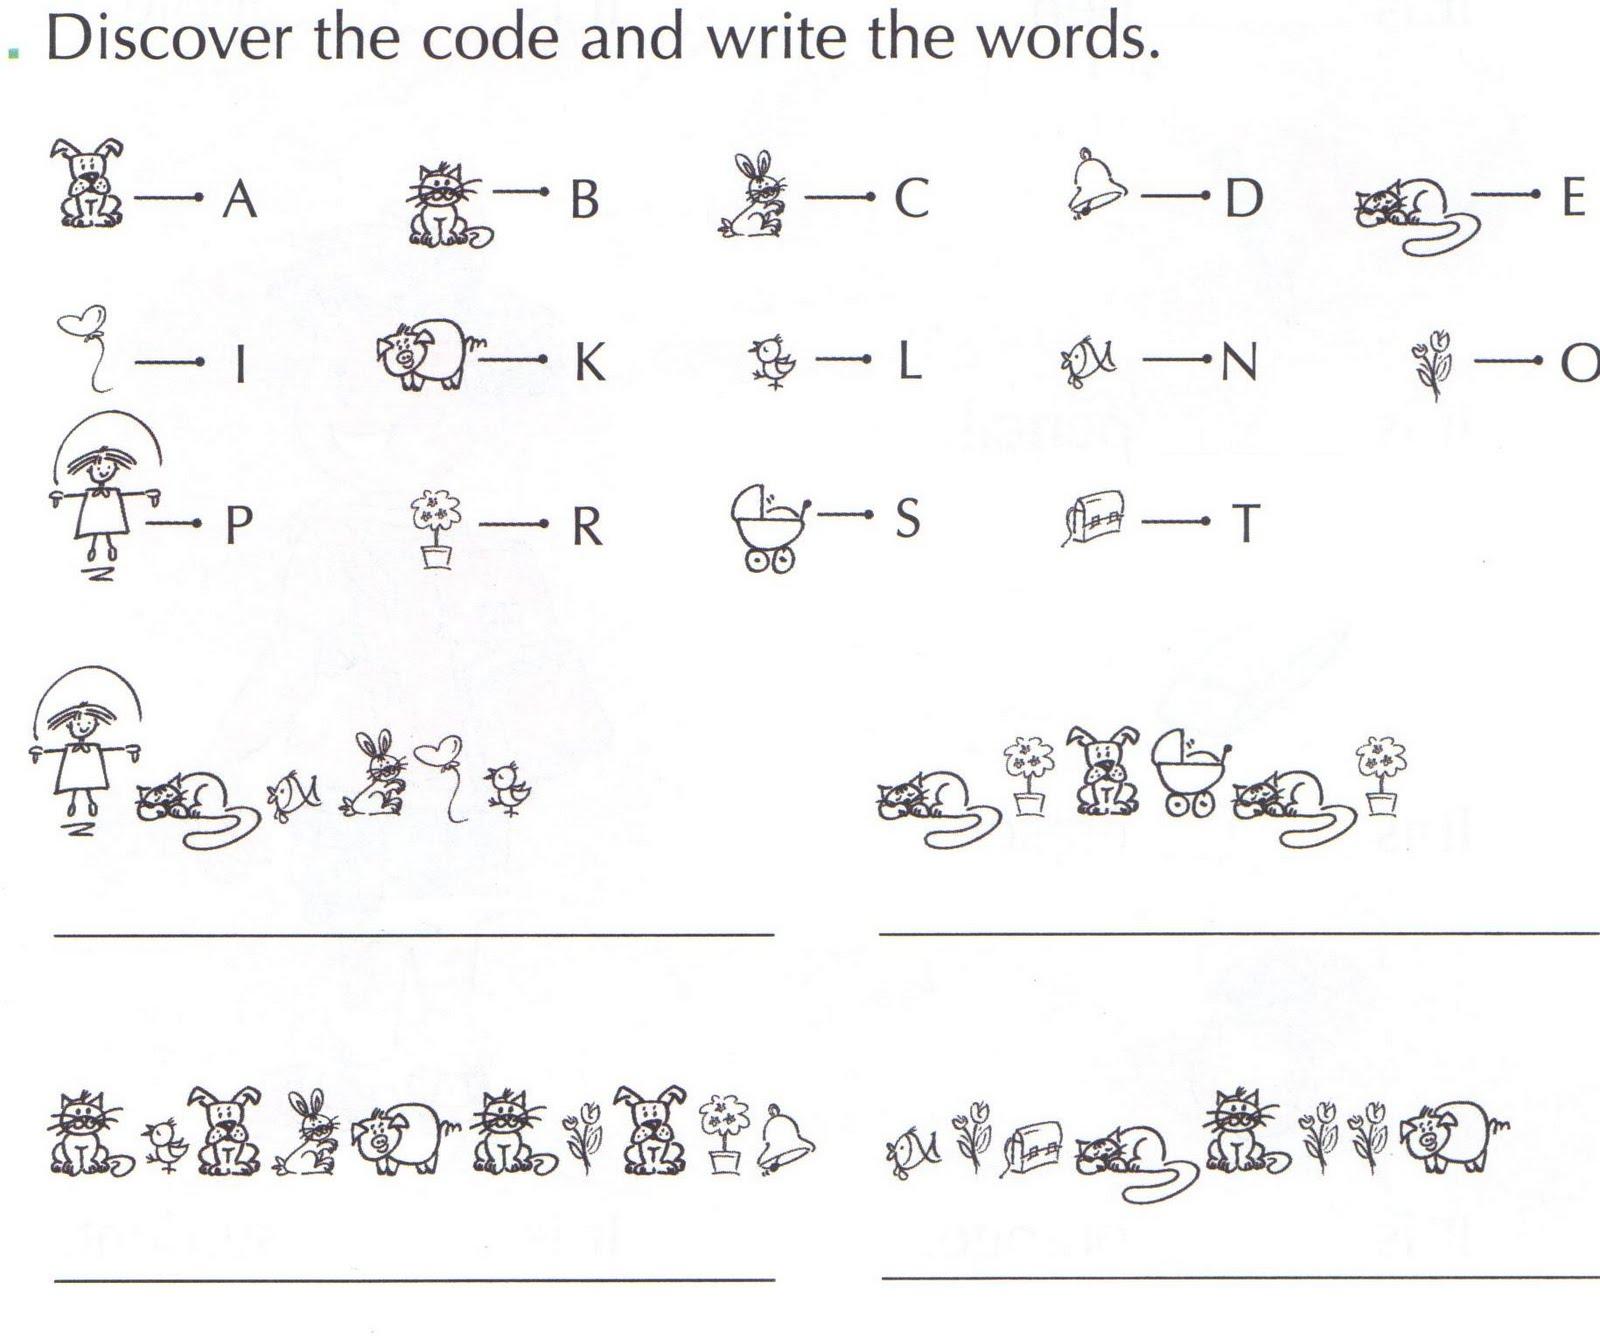 Excepcional Atividades de Inglês: Objects school (objetos escolares) SL51